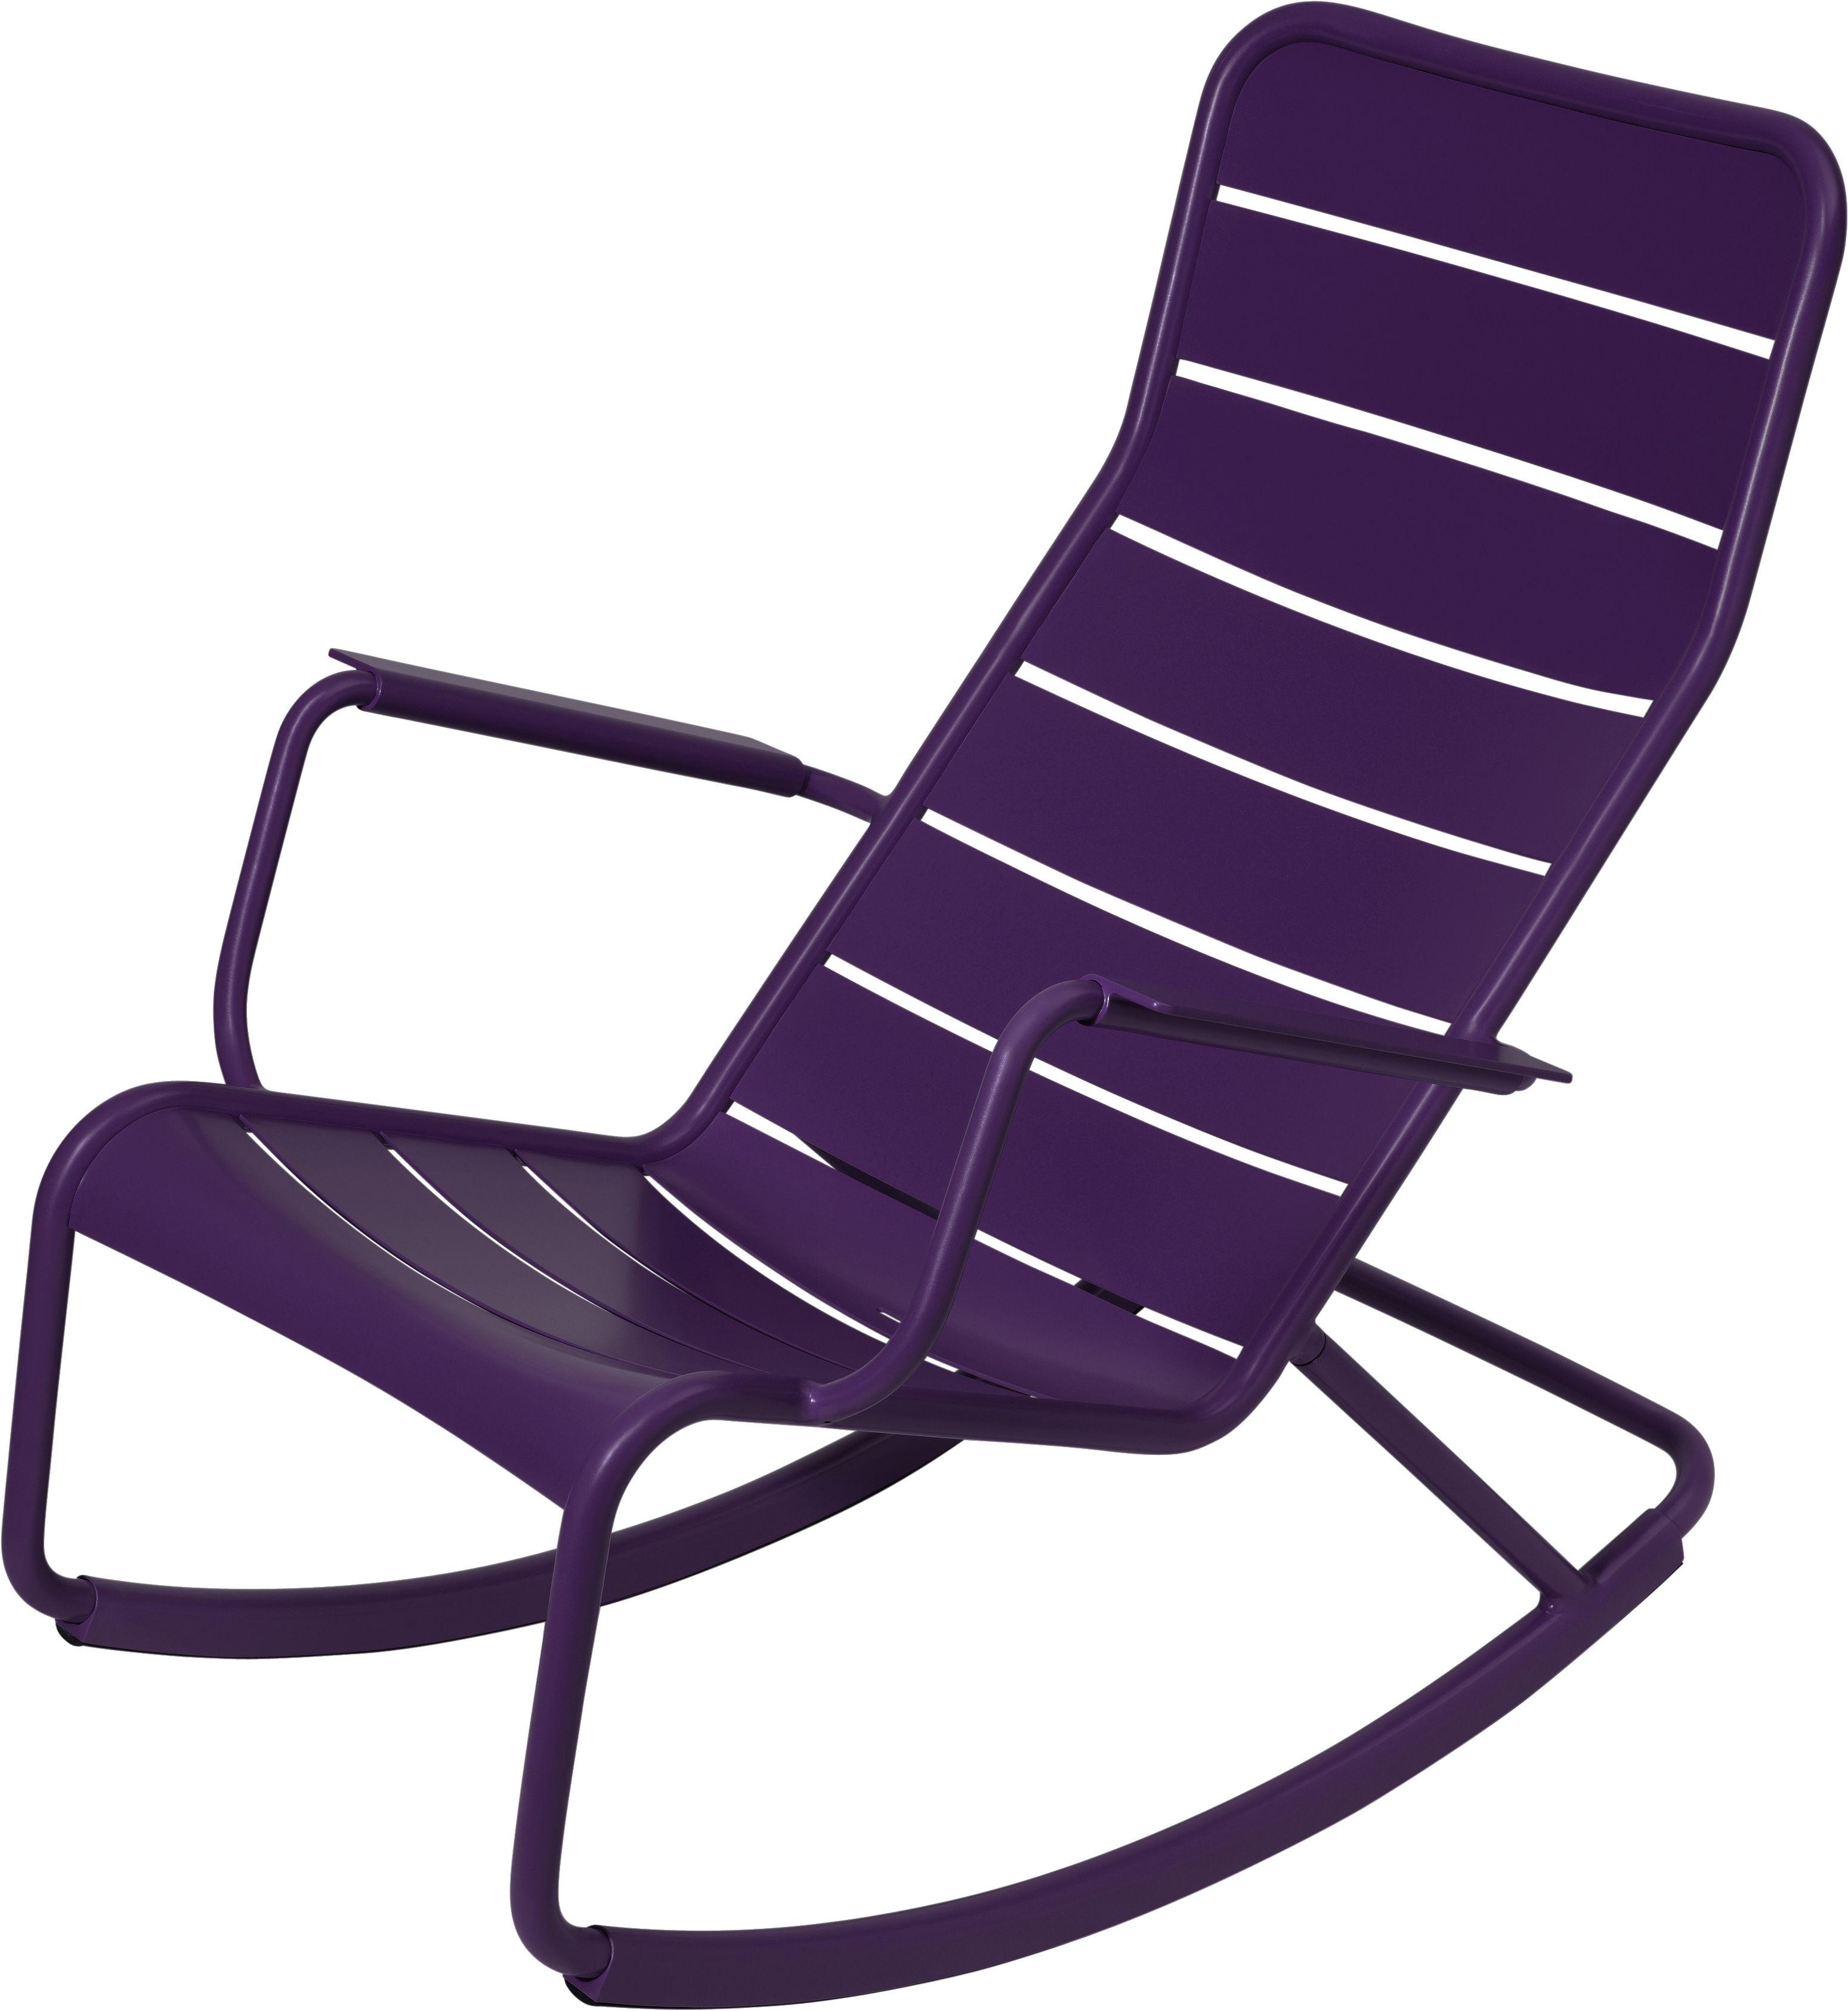 Life Style - Rocking chair Luxembourg / Aluminium - Fermob - Aubergine - Aluminium